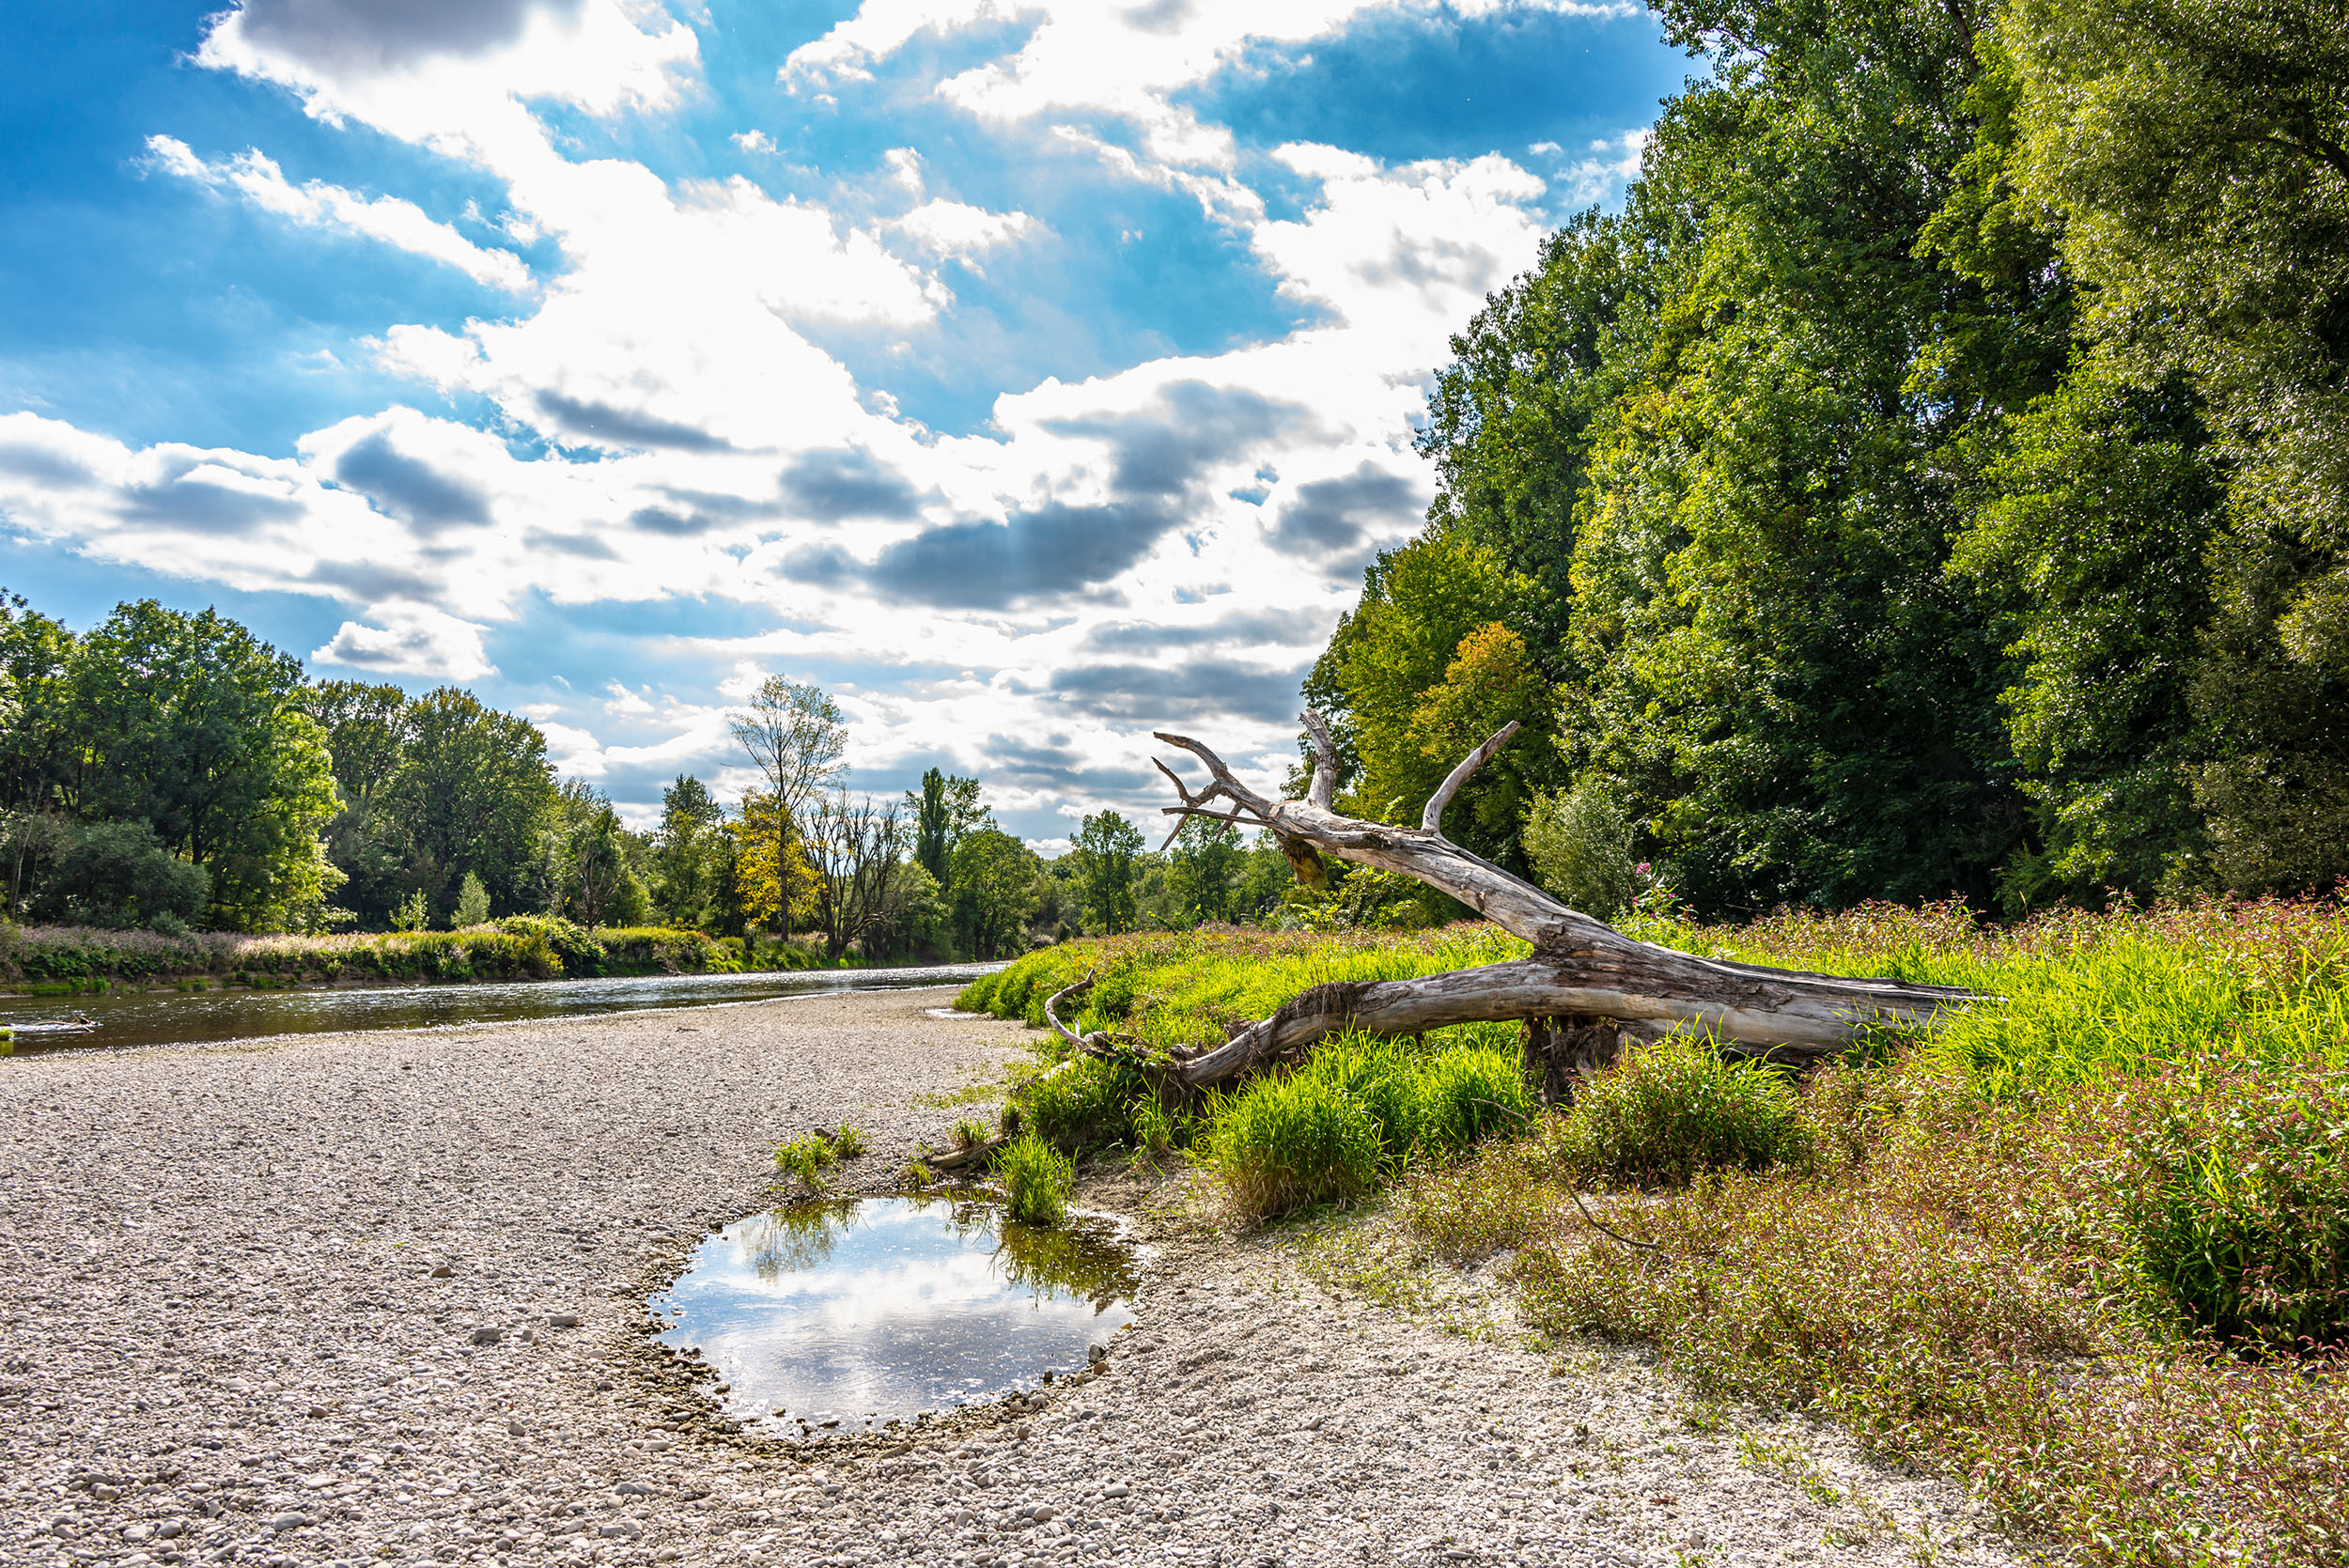 Naturschutzgebiet Isarauen